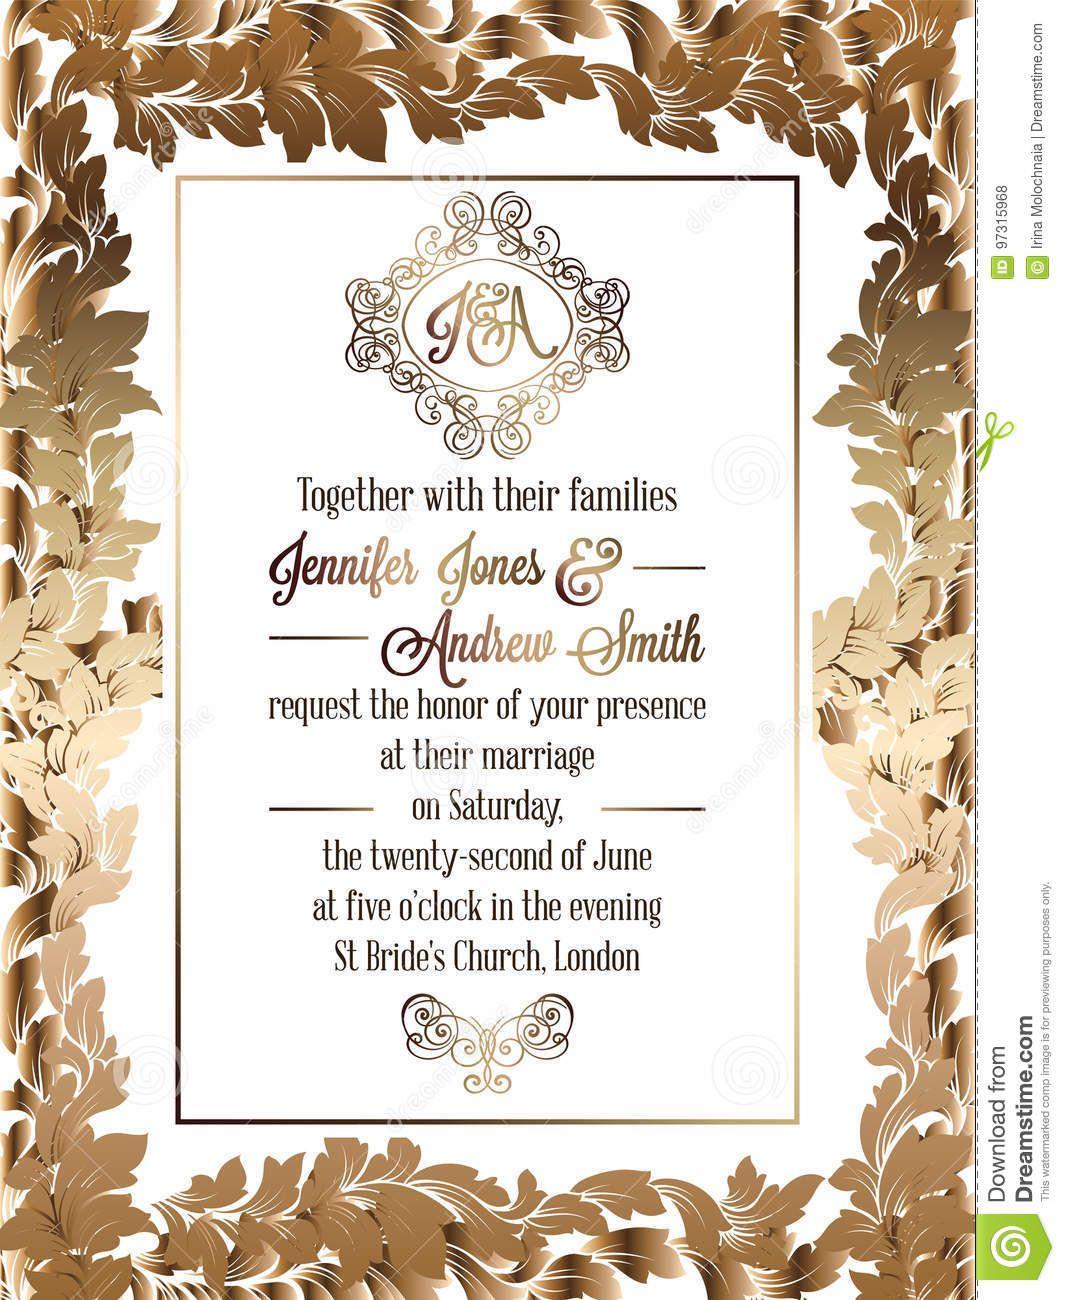 Vintage Baroque Style Wedding Invitation Card Template For Church W Wedding Invitation Card Template Wedding Invitation Cards Vintage Style Wedding Invitations